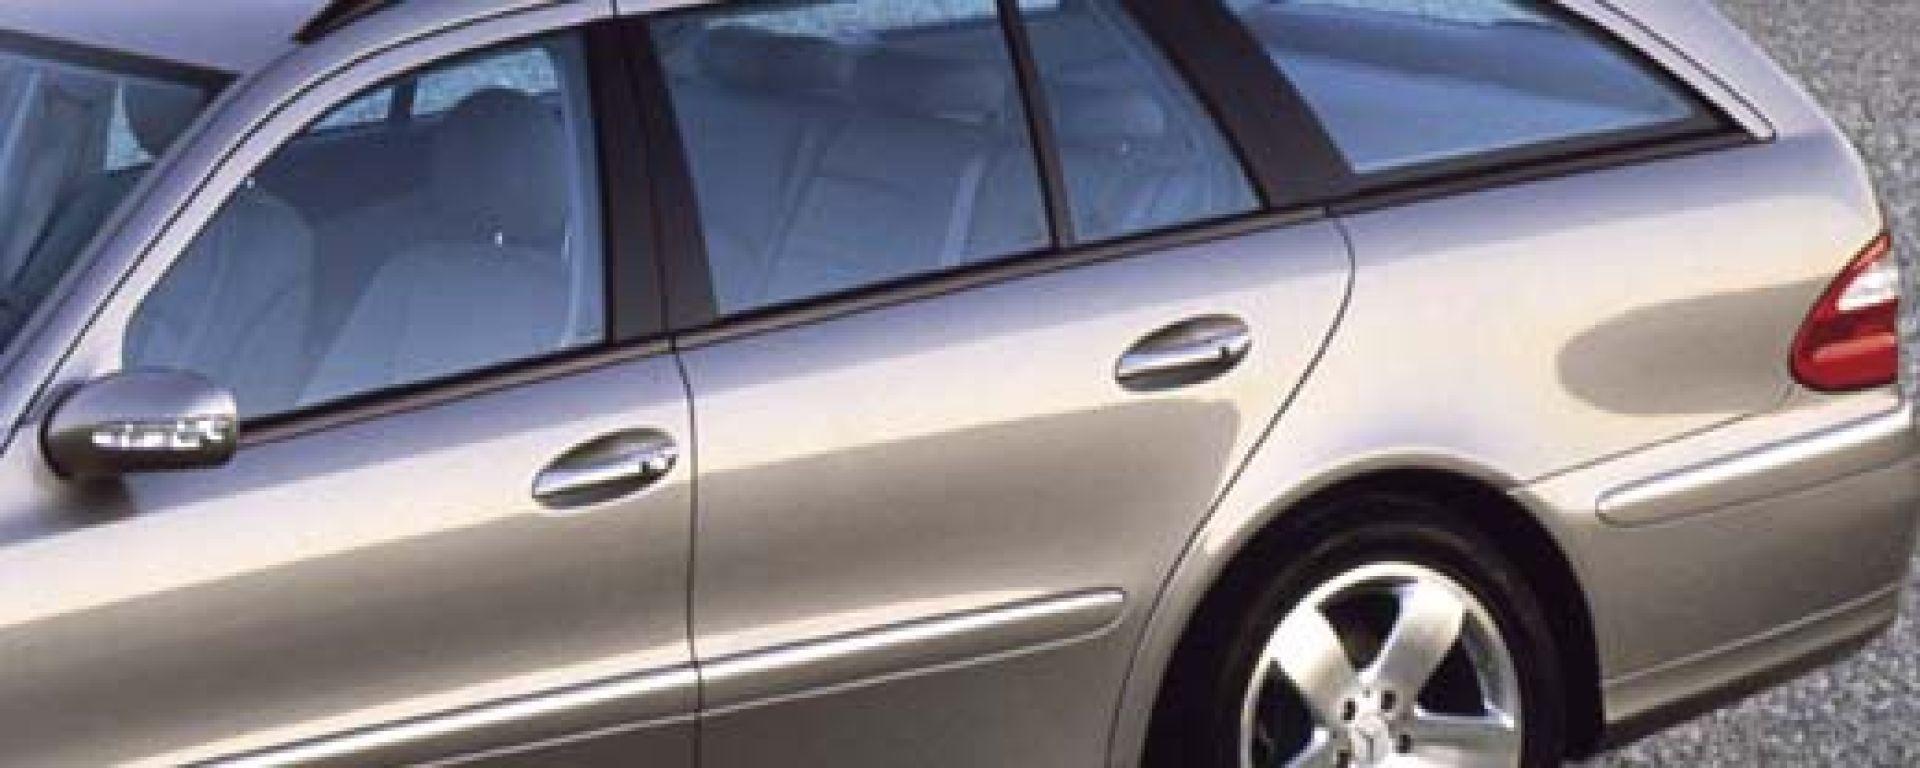 Anteprima: Mercedes Classe E SW 2003